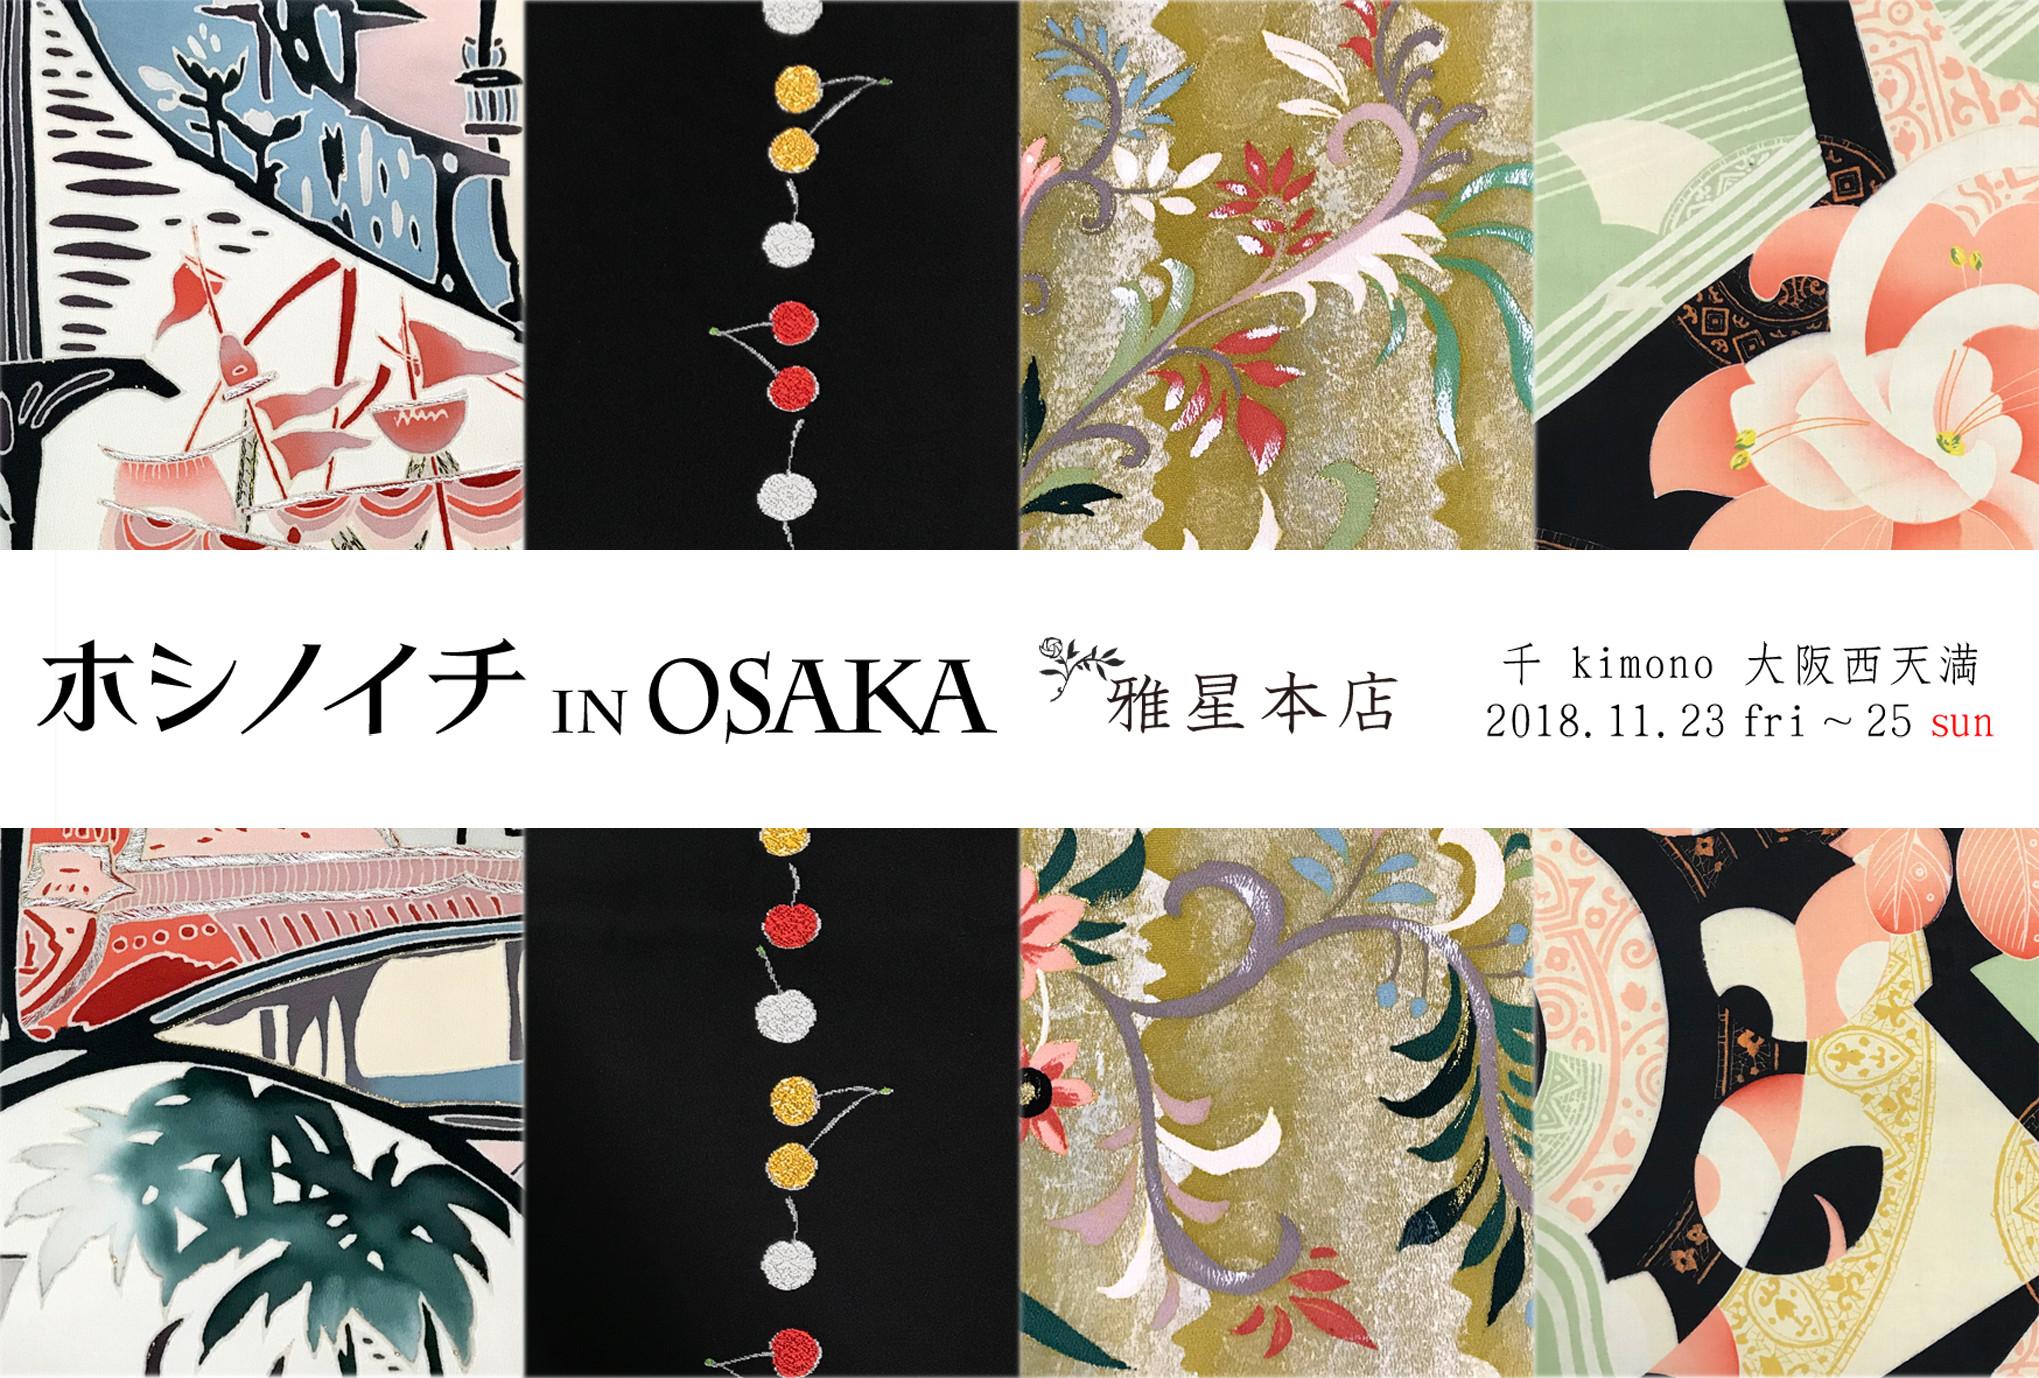 【next event】★ホシノイチ in OSAKA★